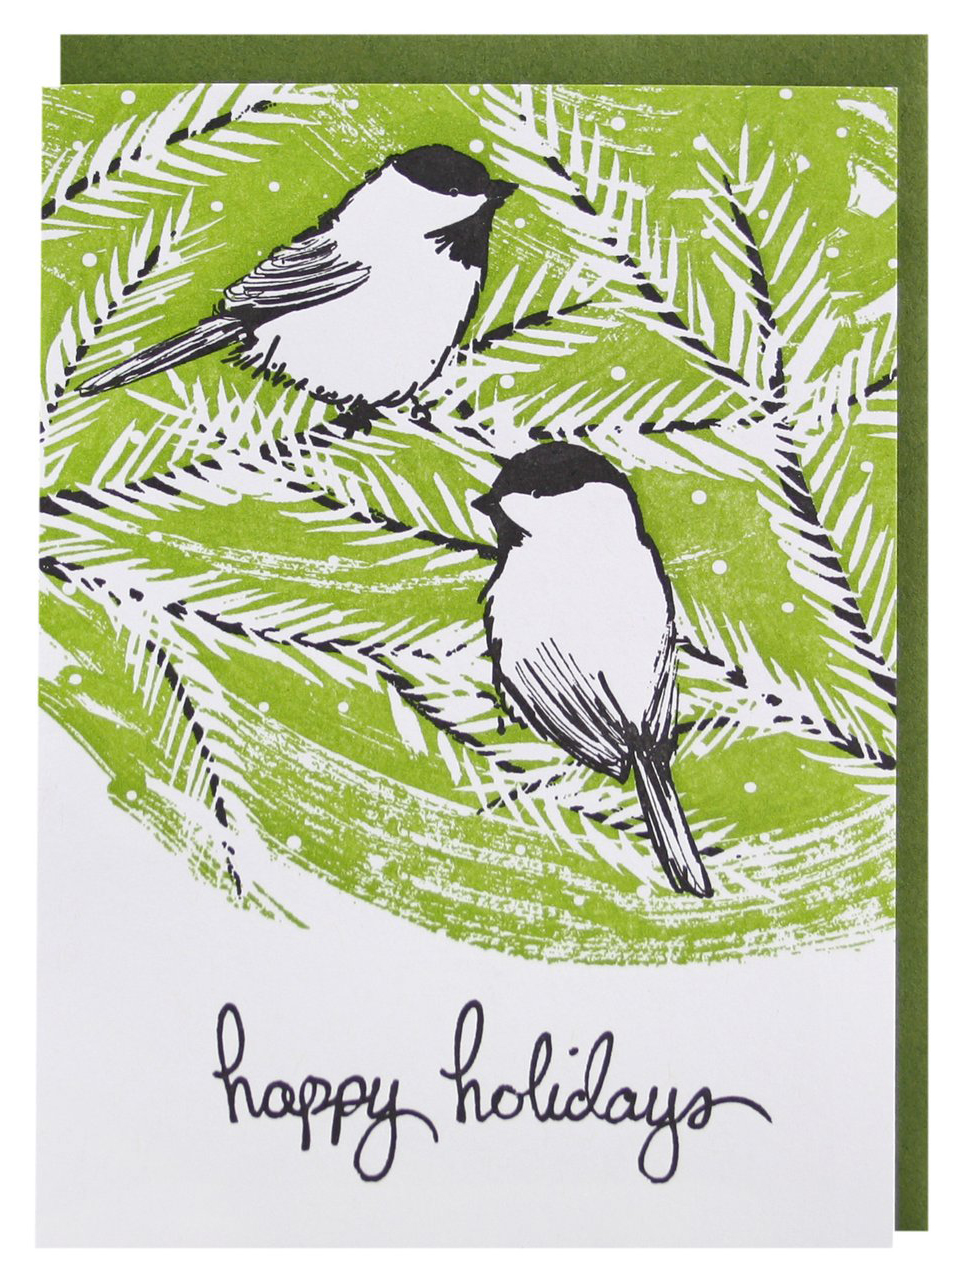 Chickadees-Holiday-Card_1280x1280.jpg